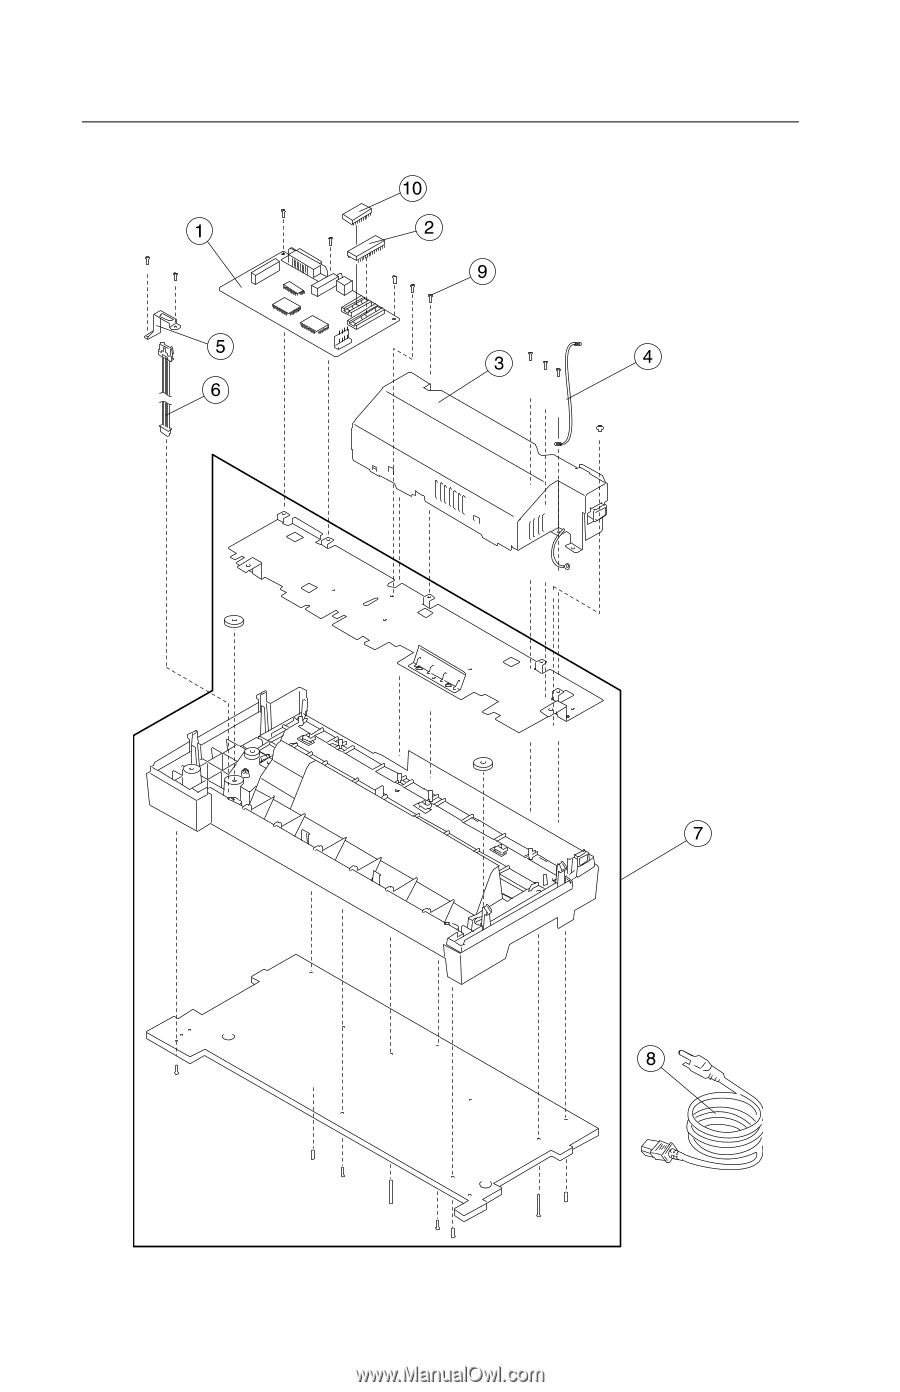 7-8. Service Manual. 4227-300